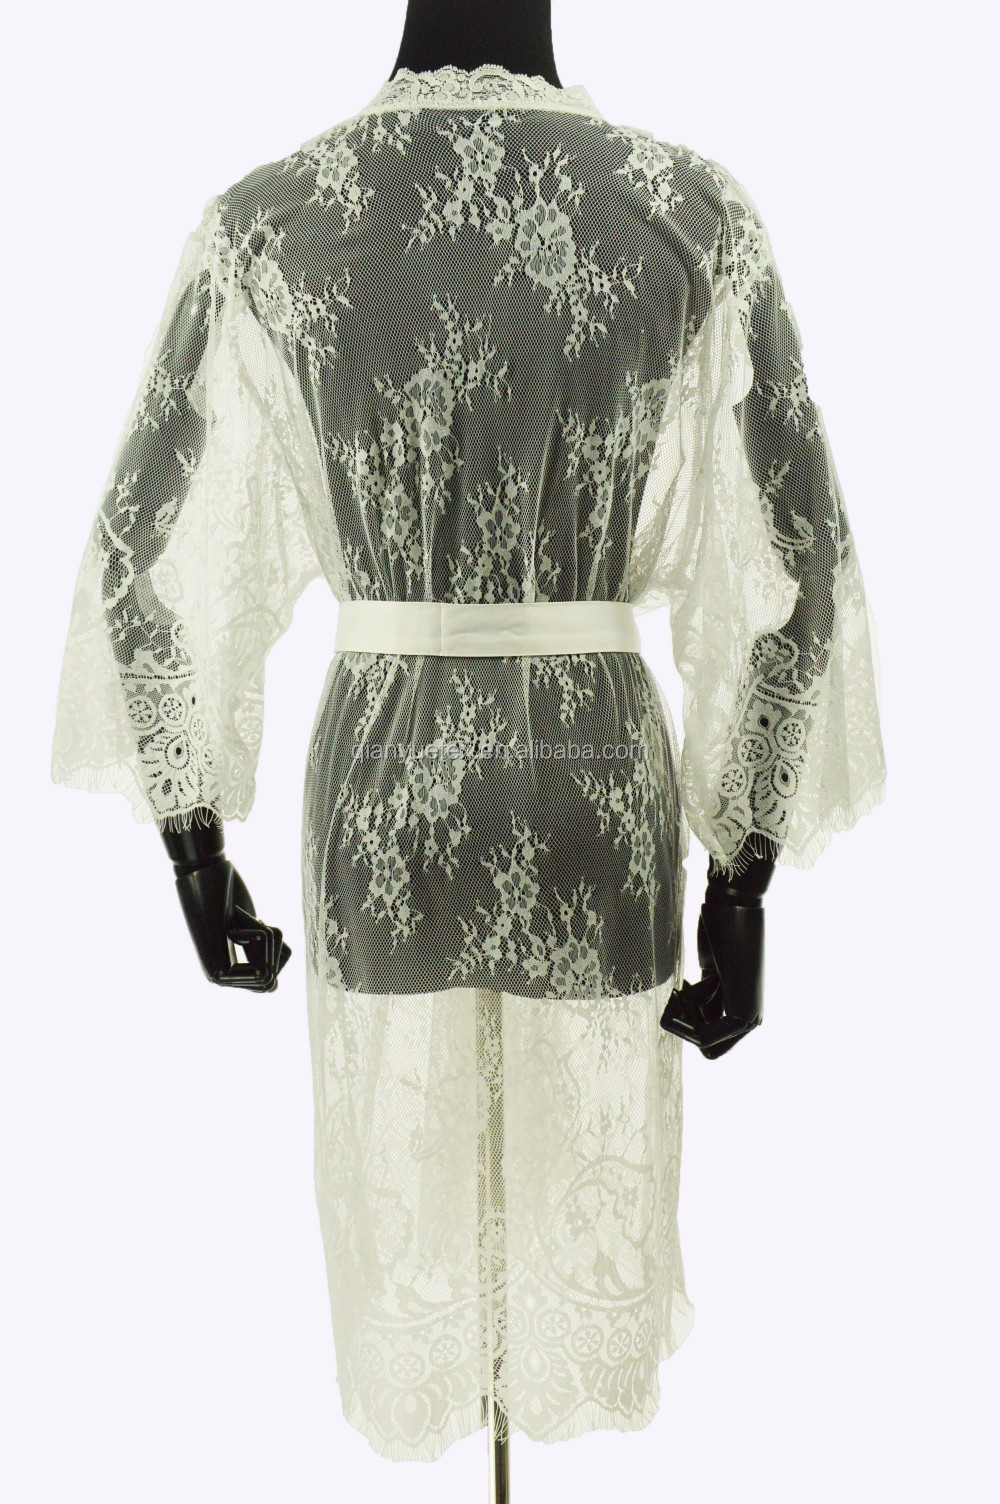 b9cc4418f20 Cheap Mature Ladies Sexy Sheer Full Lace Robes - Buy Sexy Kimono ...